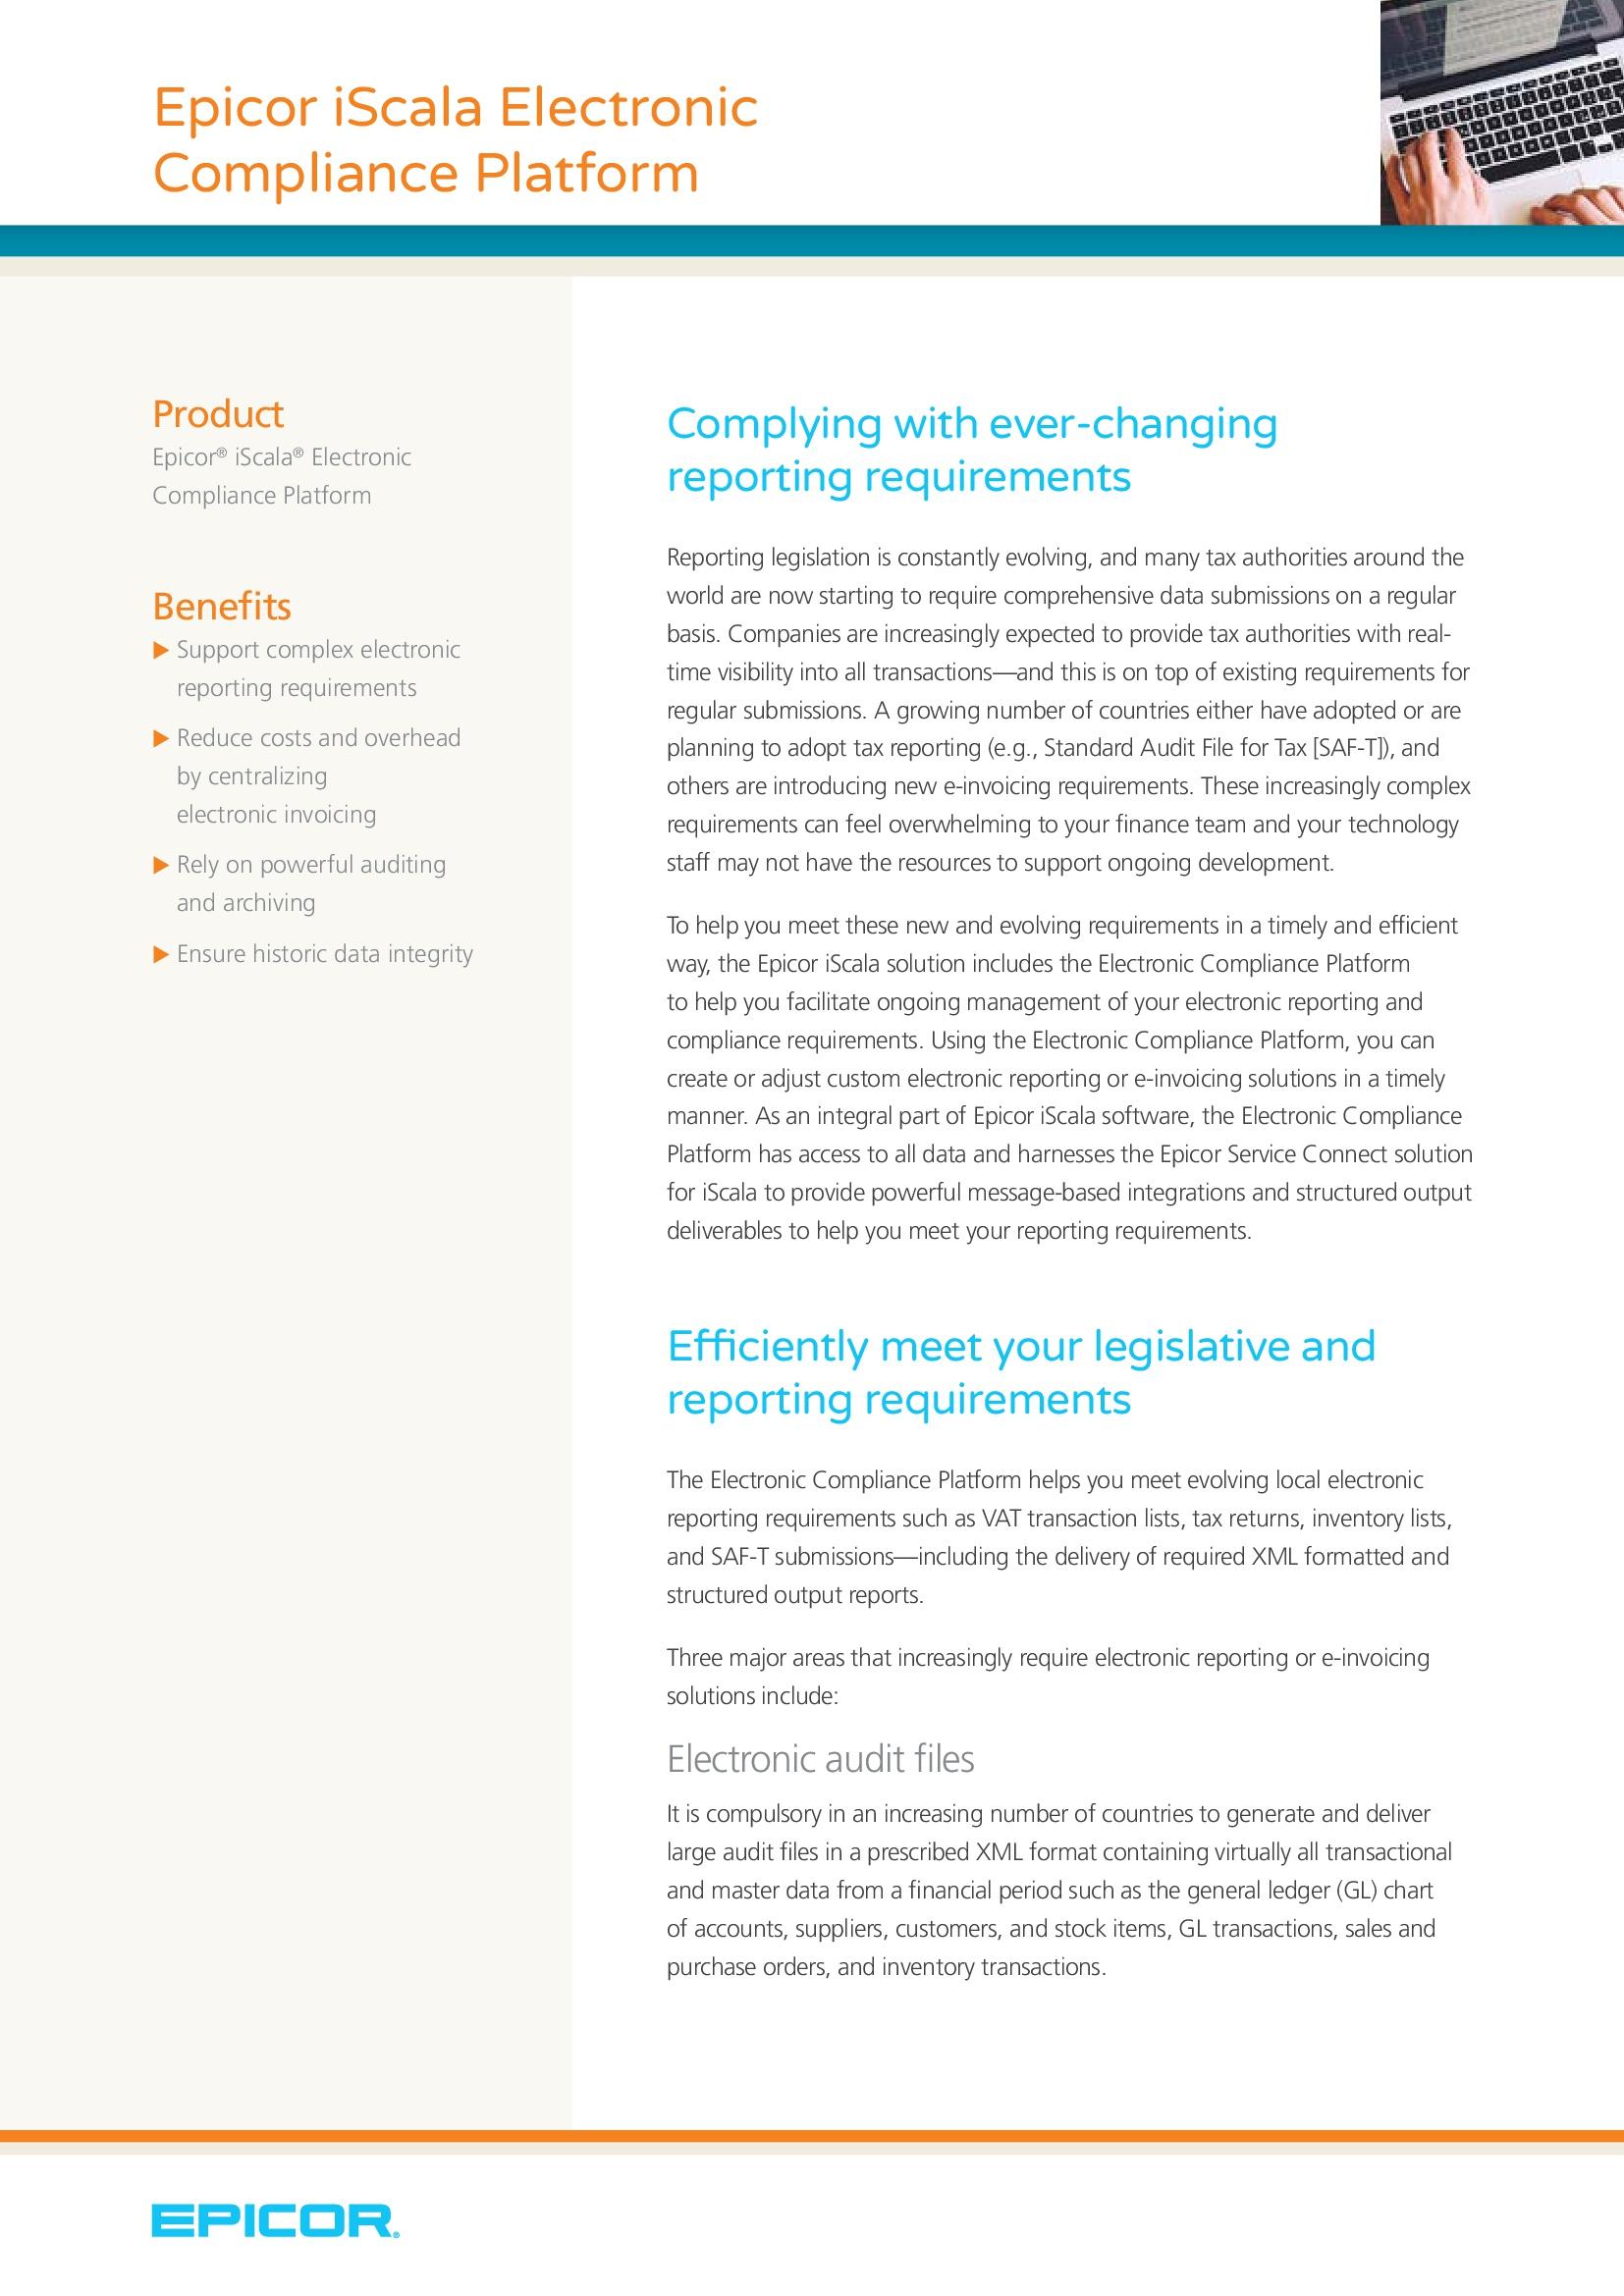 Electronic Compliance Platform